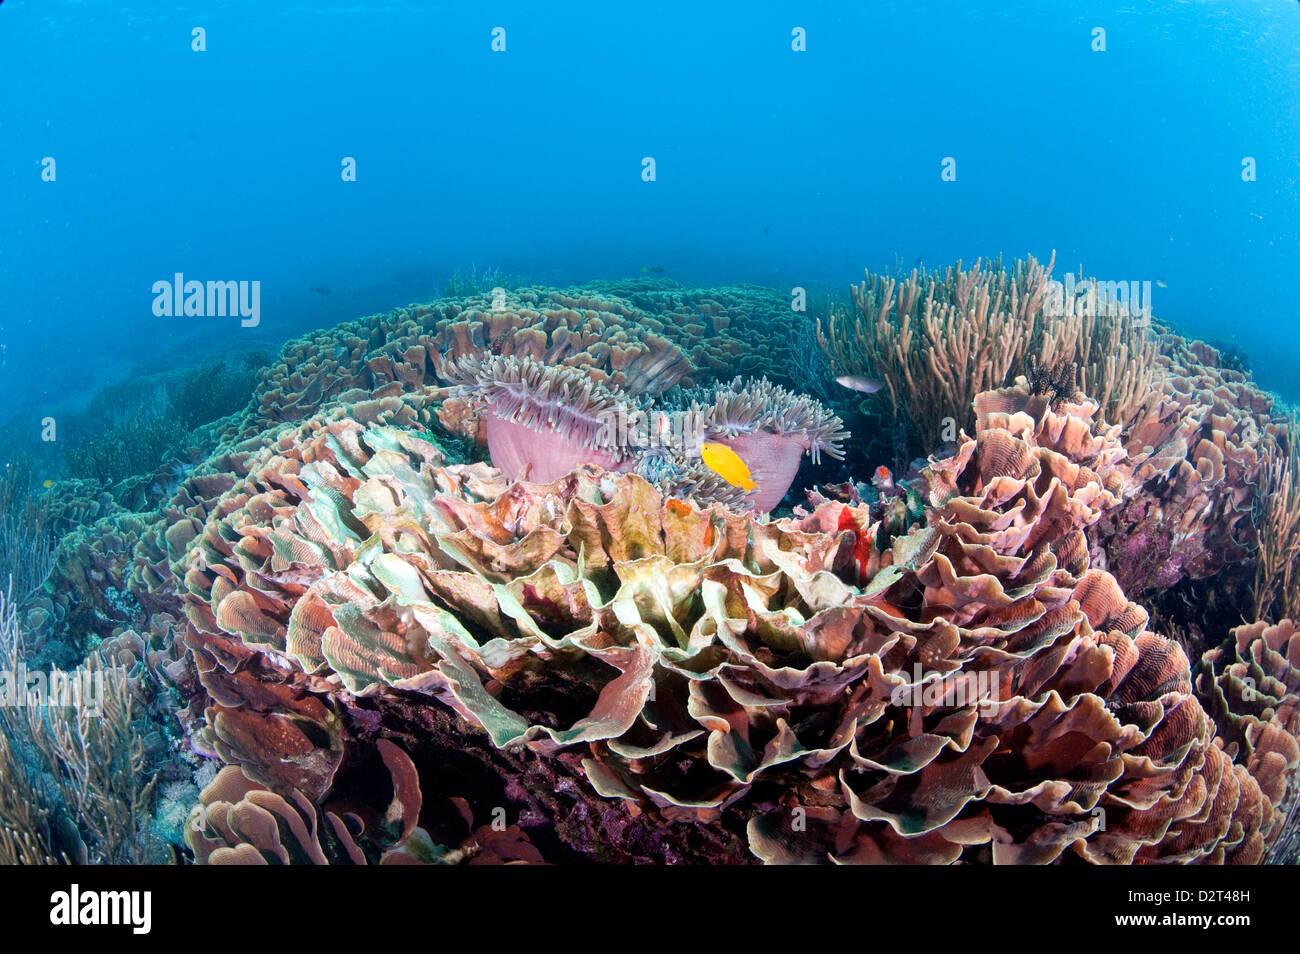 Hard Coral reef scena, Komodo, Indonesia, Asia sud-orientale, Asia Immagini Stock